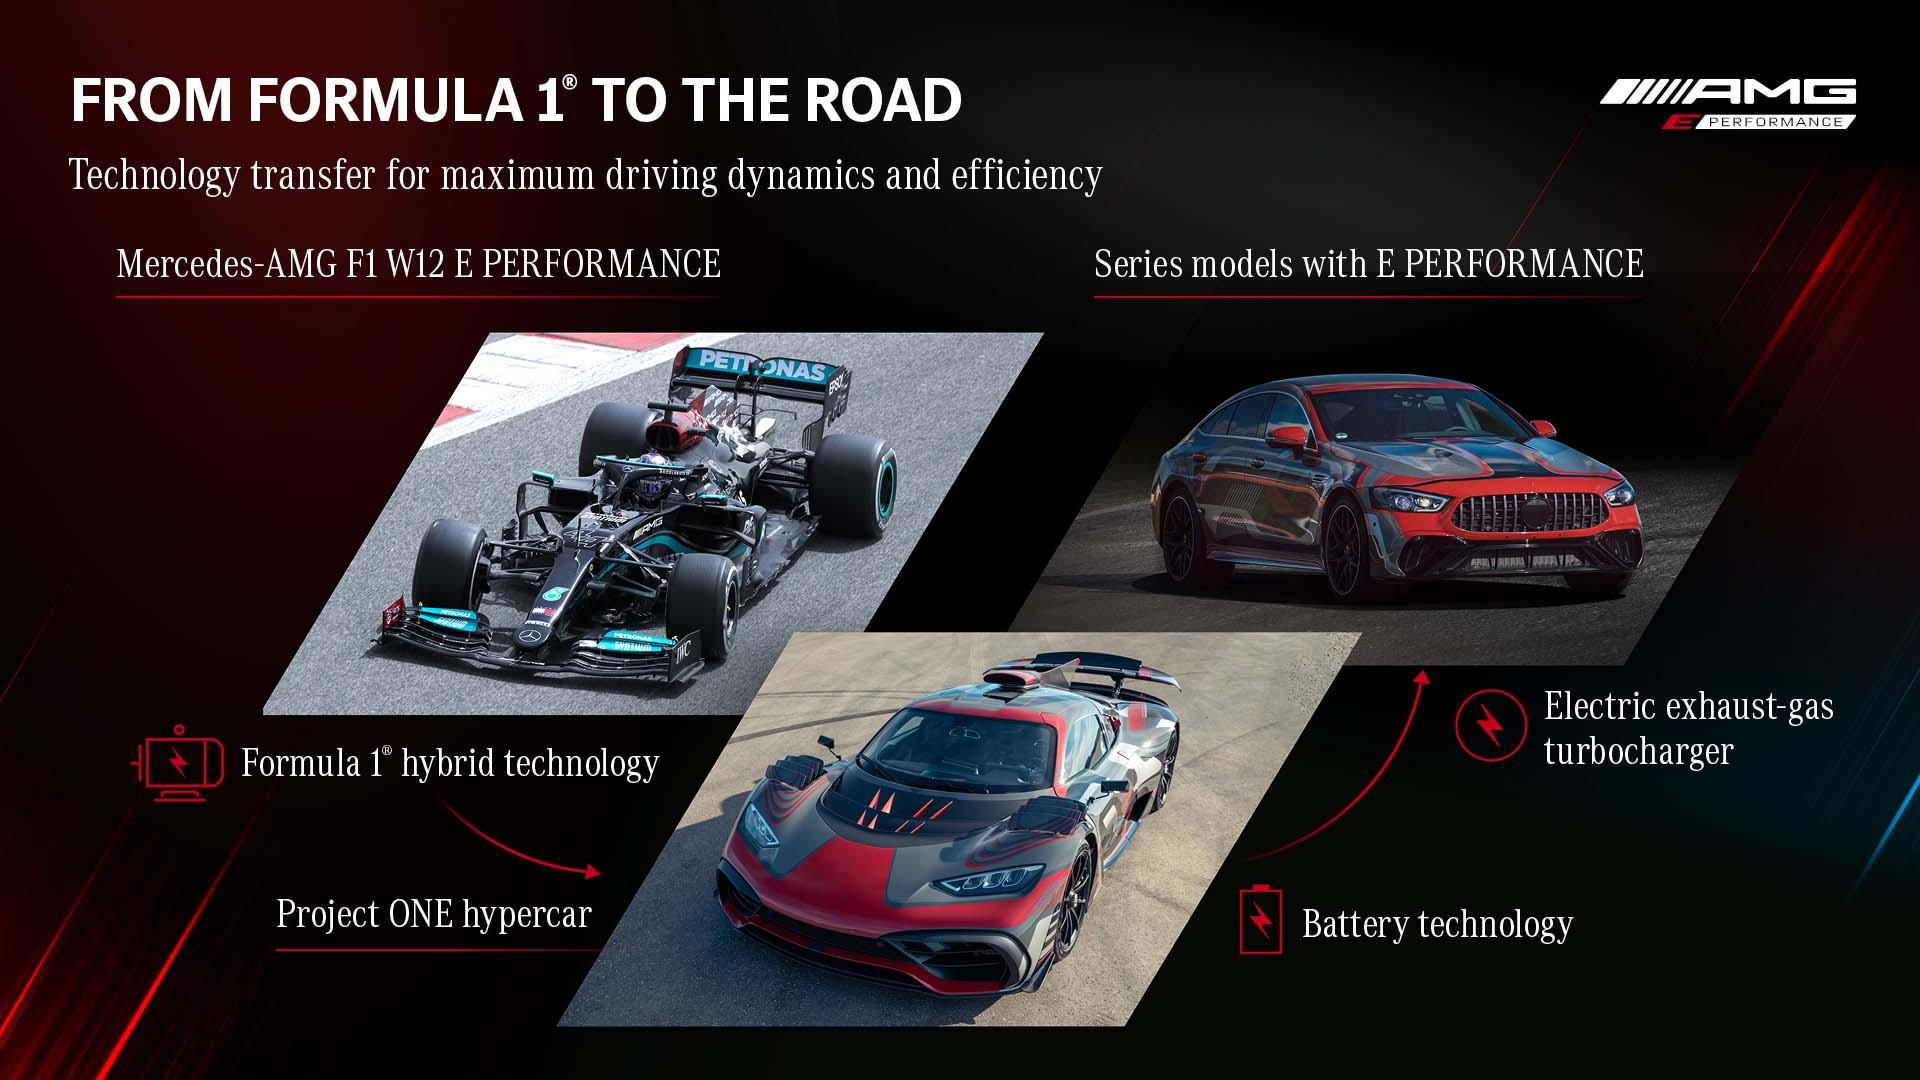 Mercedes-AMG E Performance